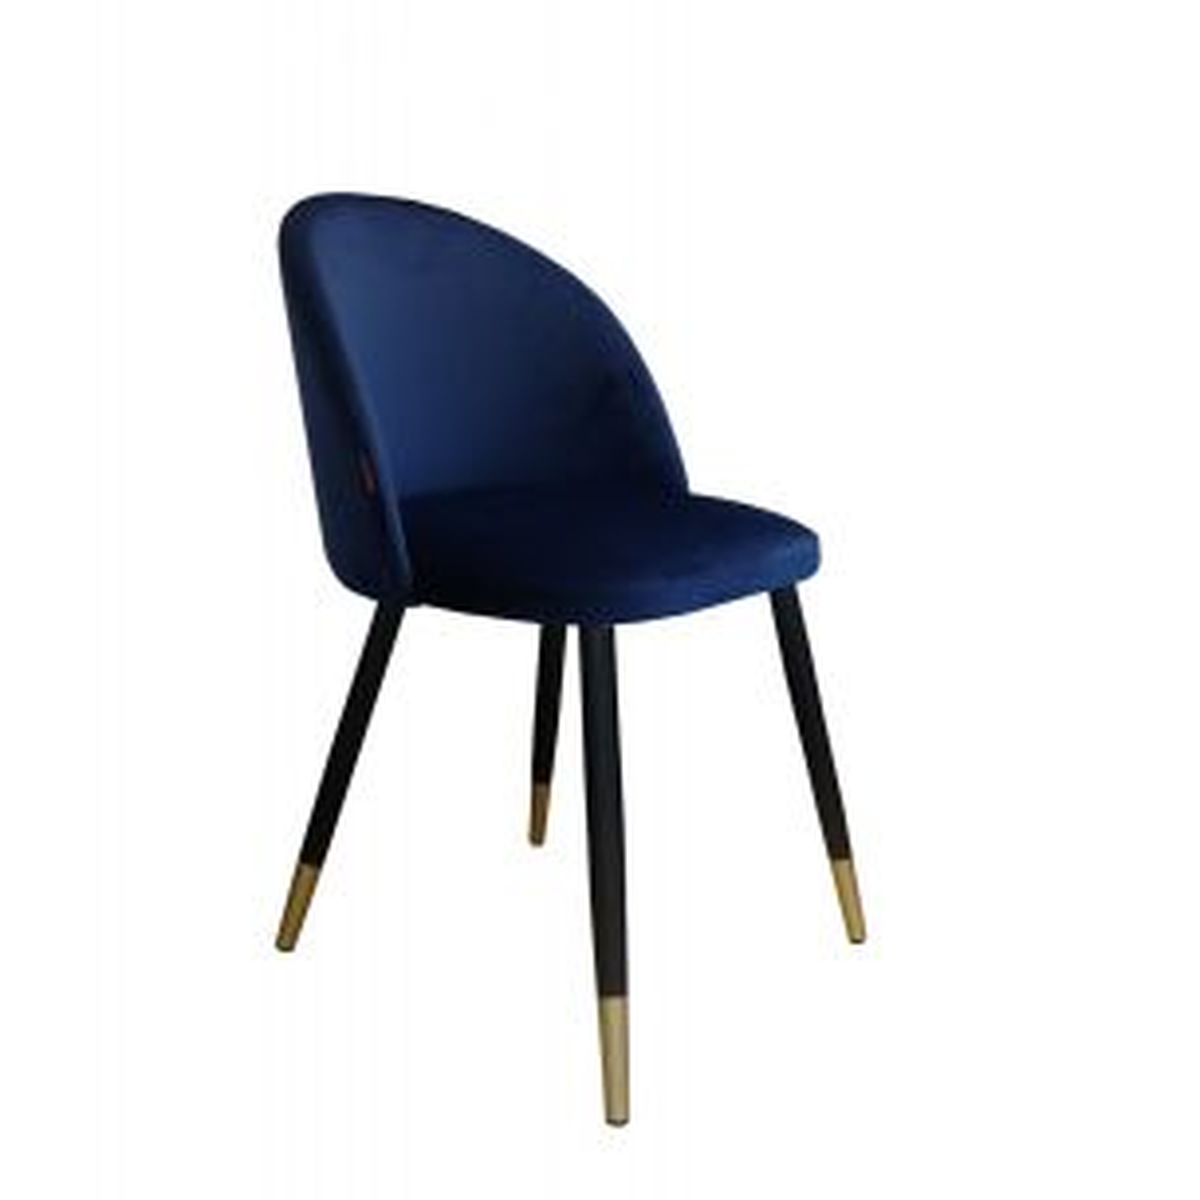 Krzesło CLAUDINE 1 VELVET GOLD granatowe